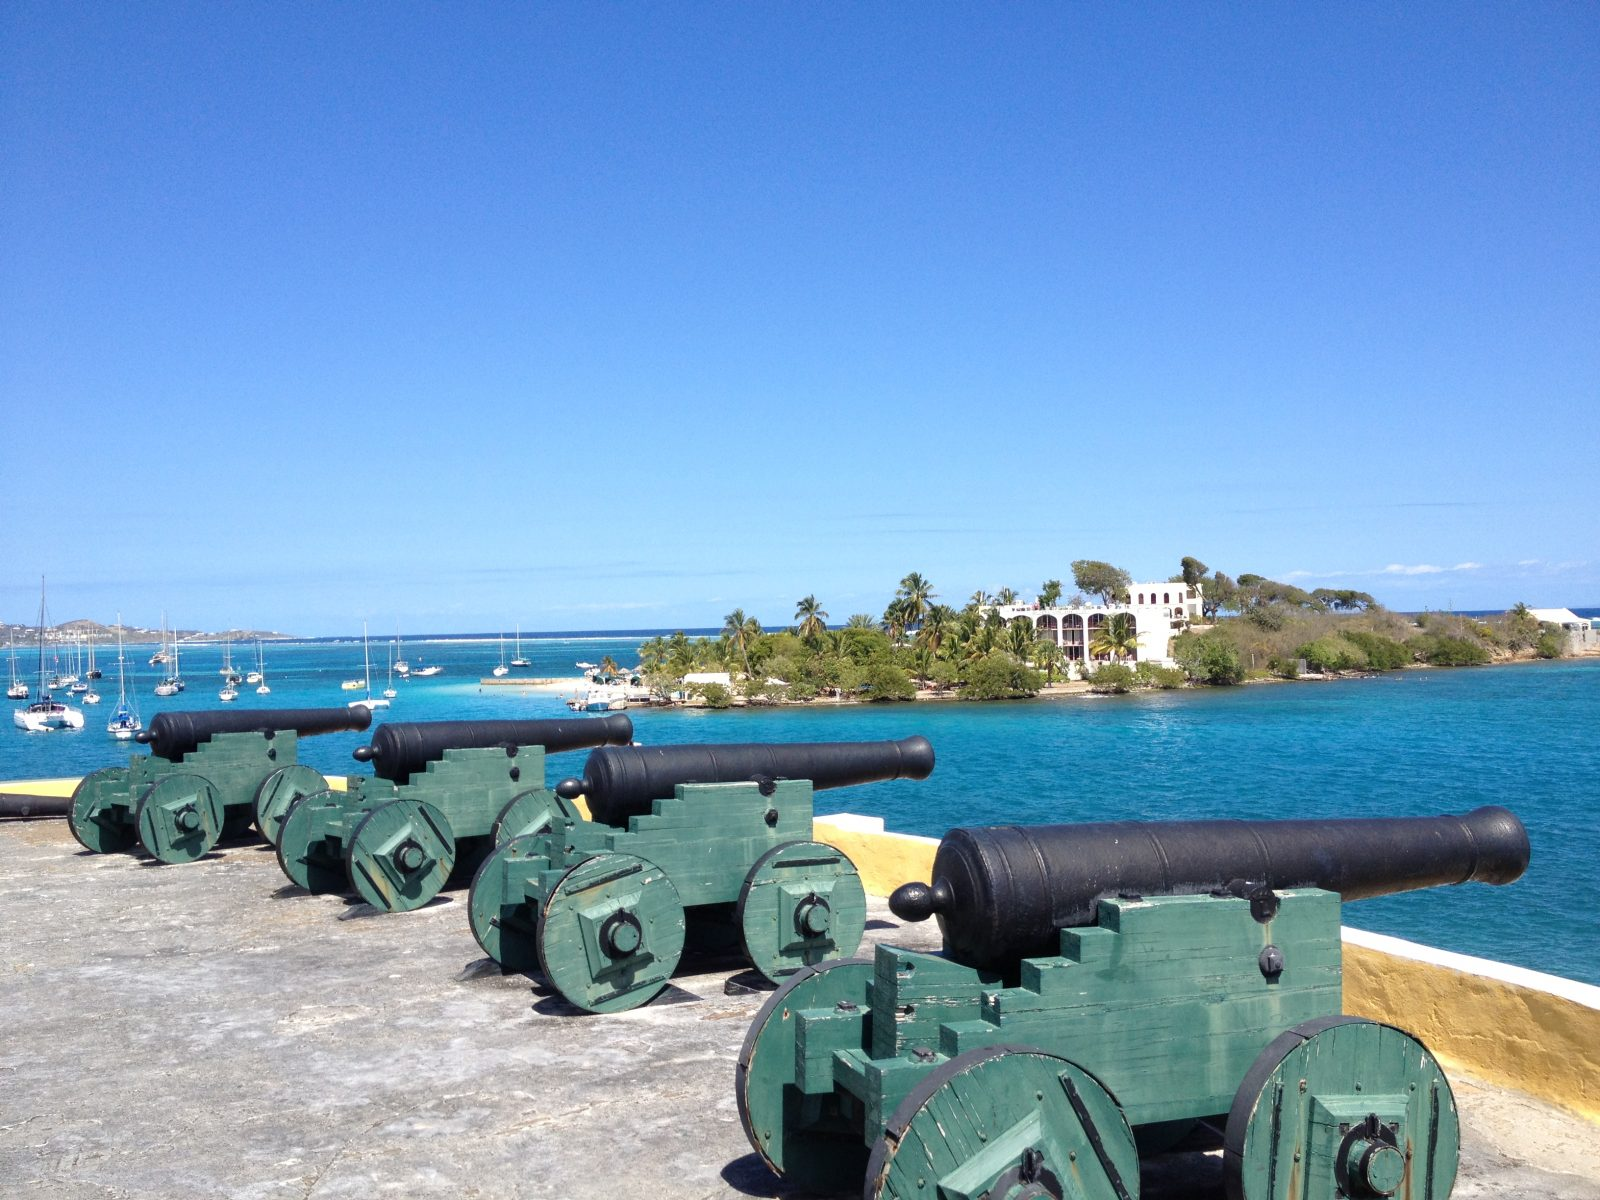 Christiansted, St. Croix, U.S. Virgin Islands.